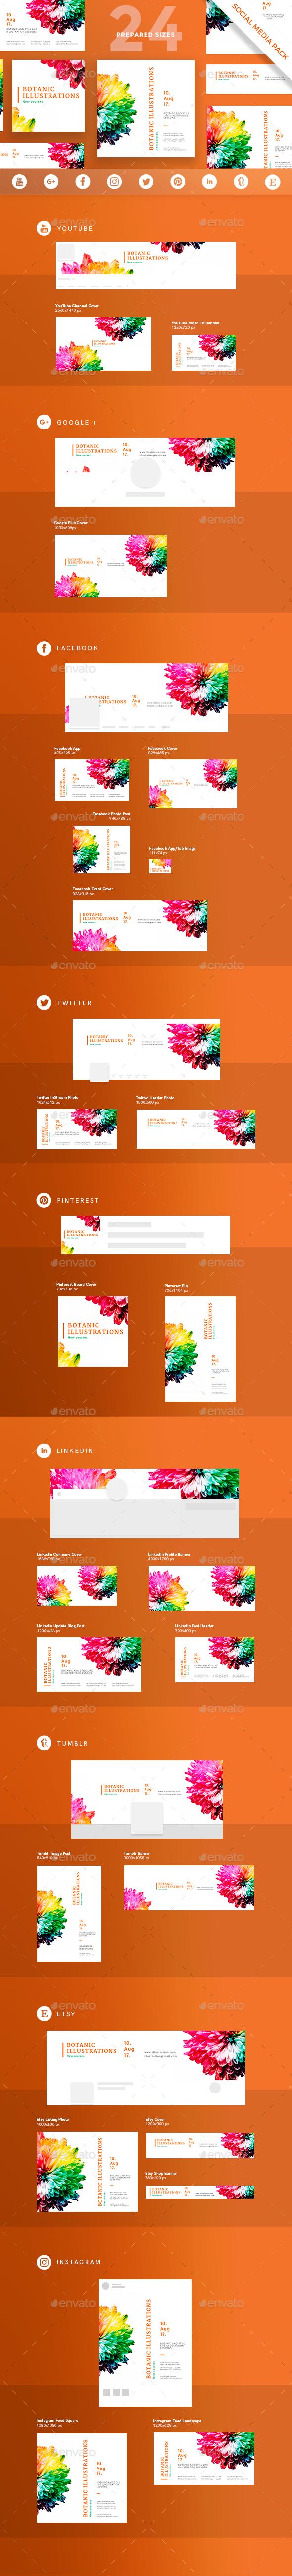 Botanic Illustrations Social Media Pack - Miscellaneous Social Media